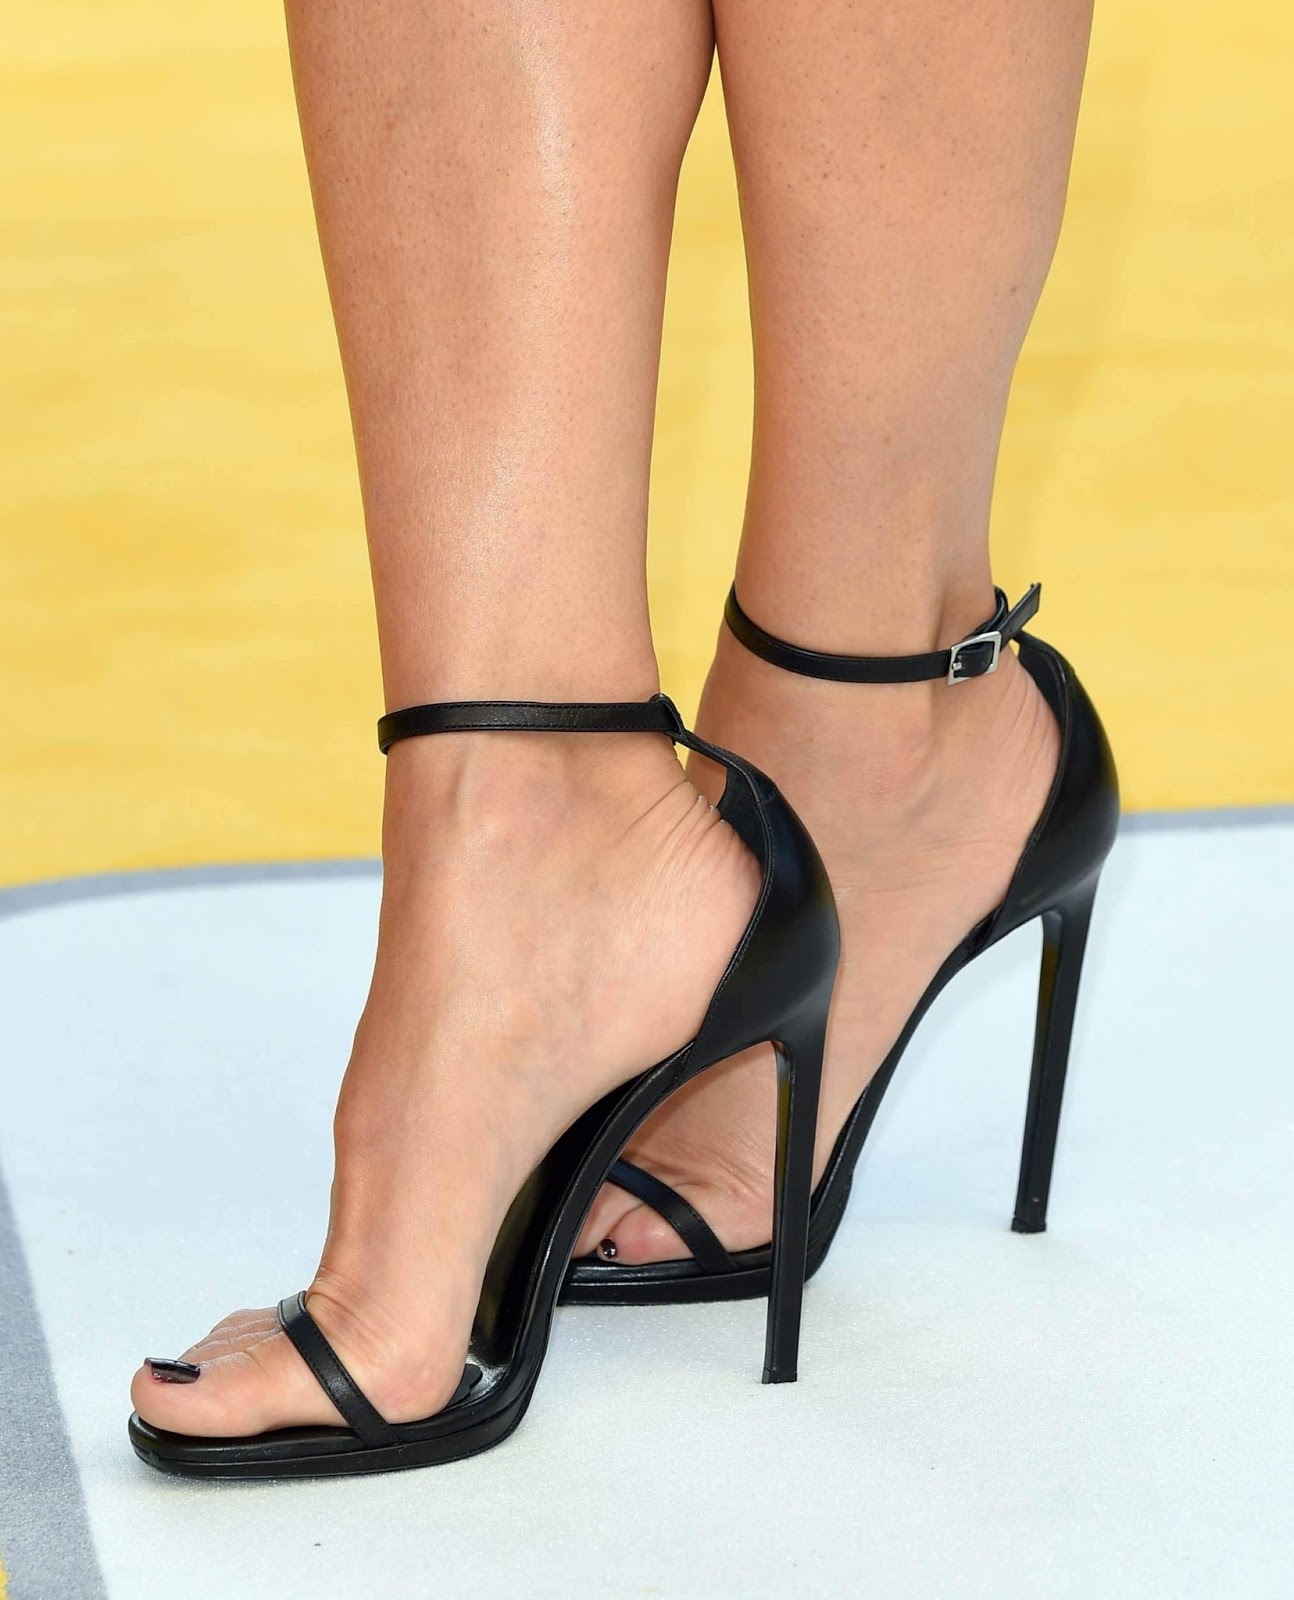 sandra bullock feet pictures